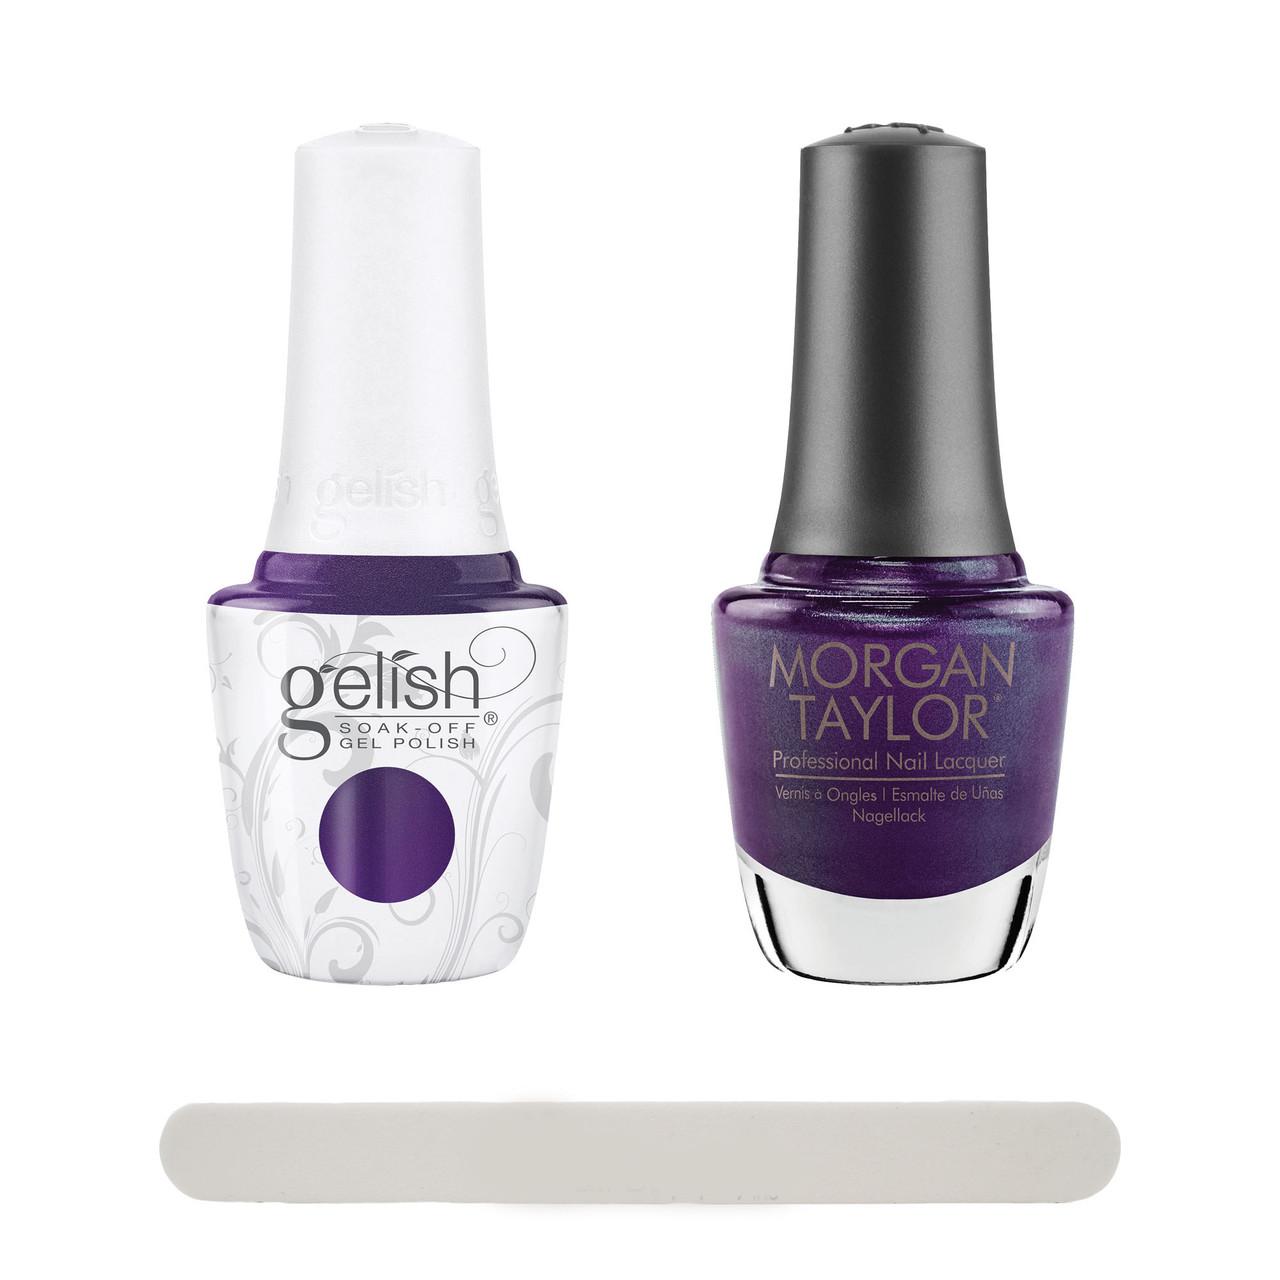 "Gelish Disney Villains ""Make 'Em Squirm"" 2 pc. Duo - Soak-Off Gel Polish and Lacquer - Purple/Blue Pearl"